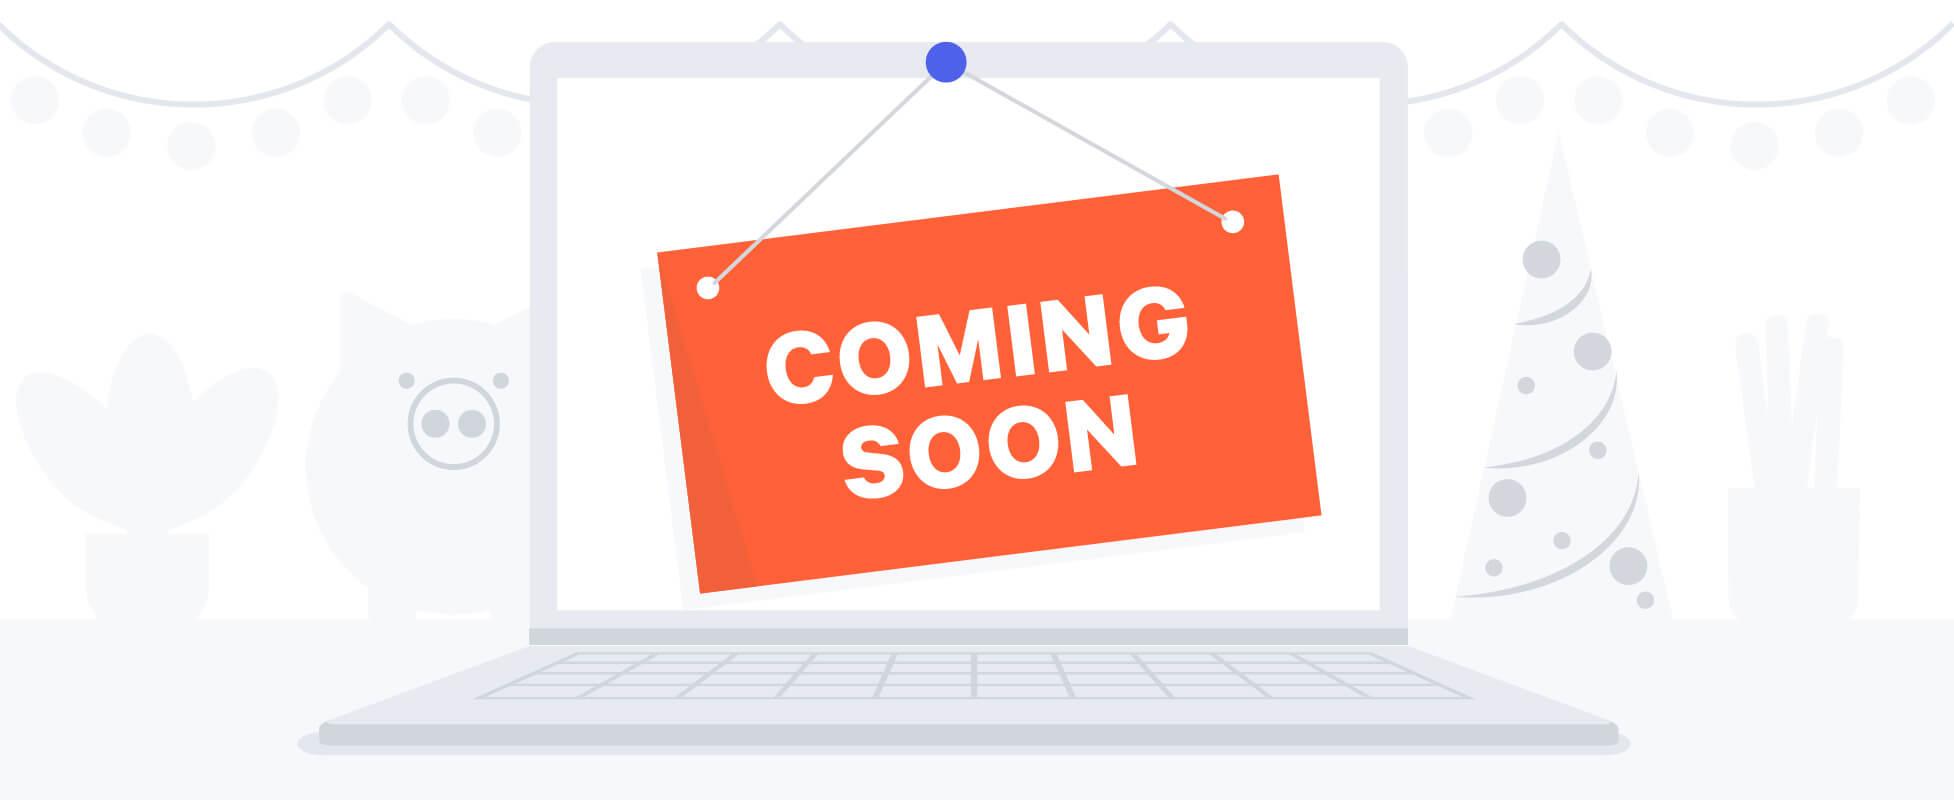 website coming soon illustration